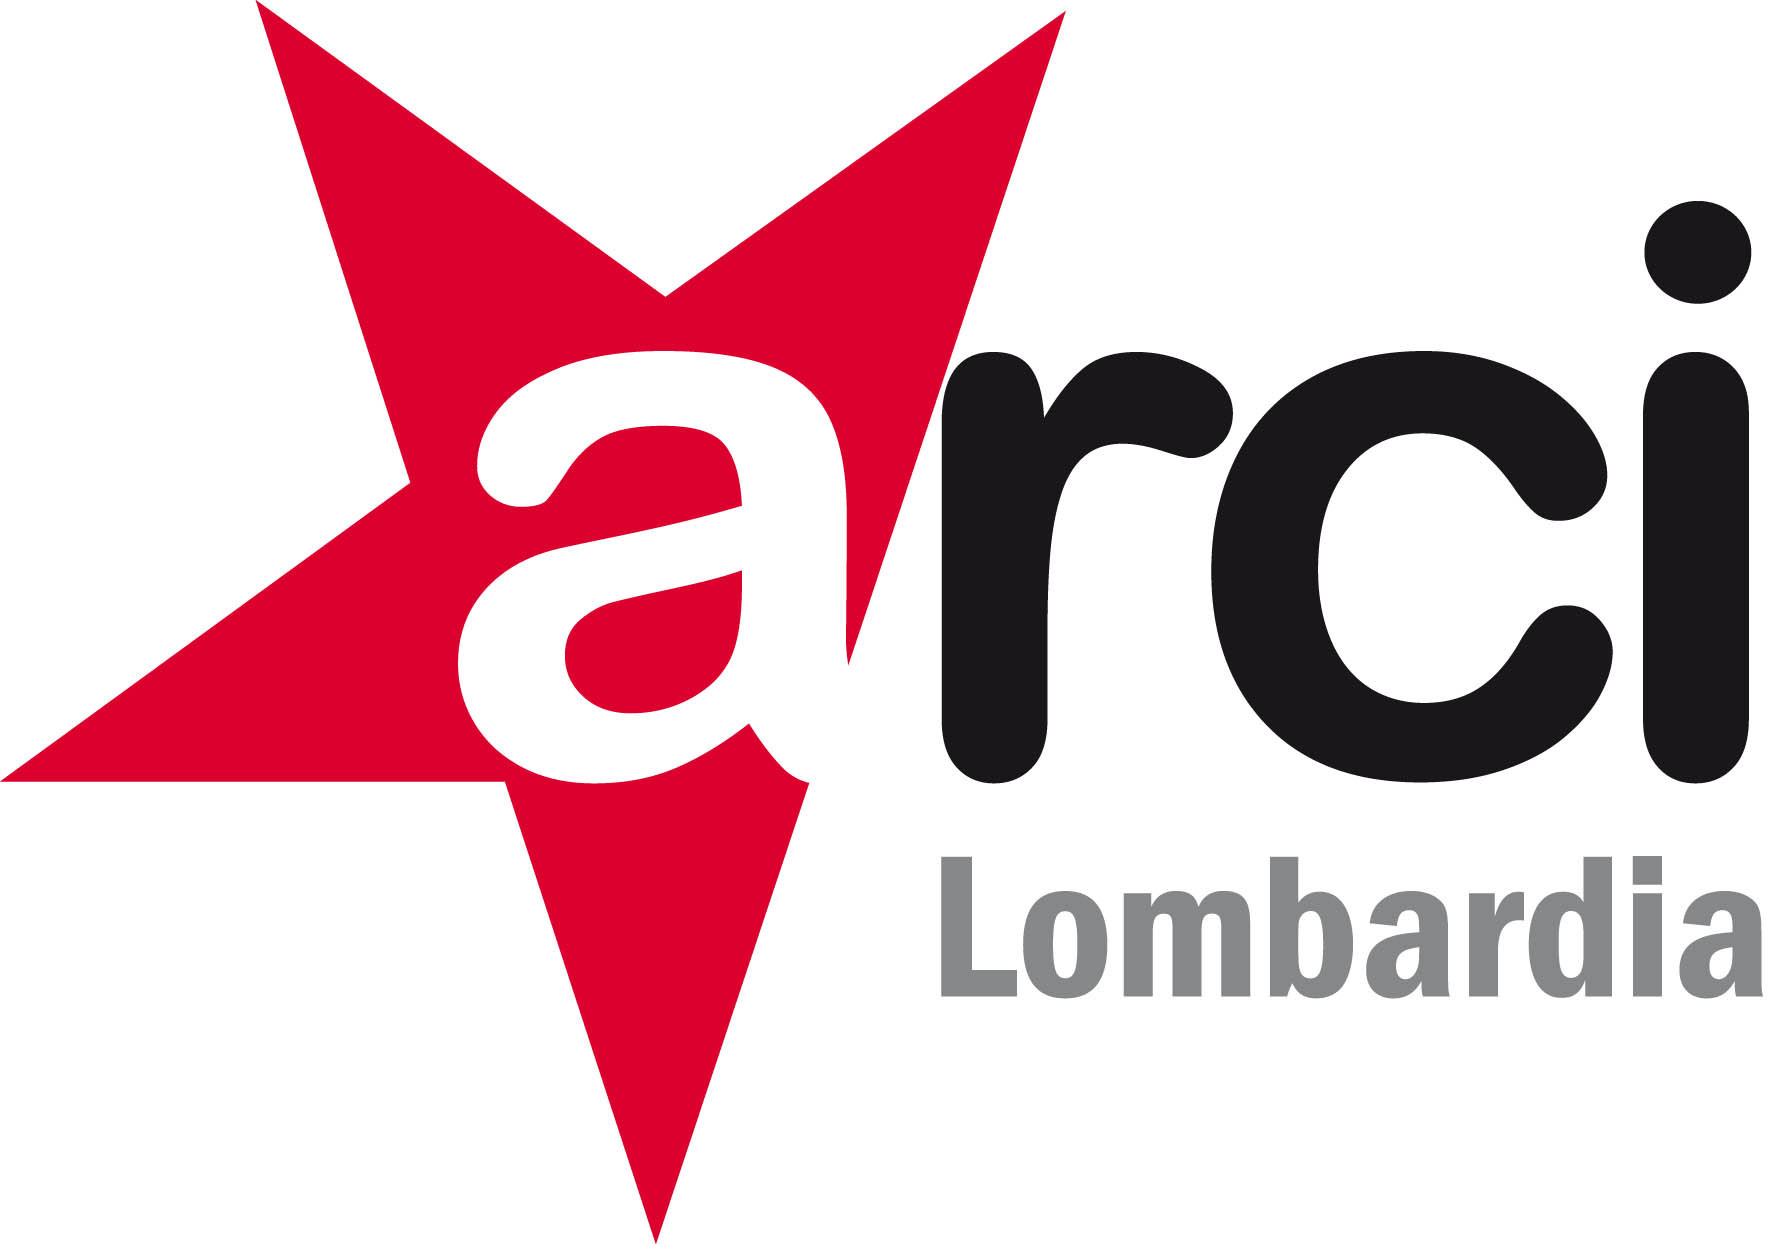 Arci Lombardia